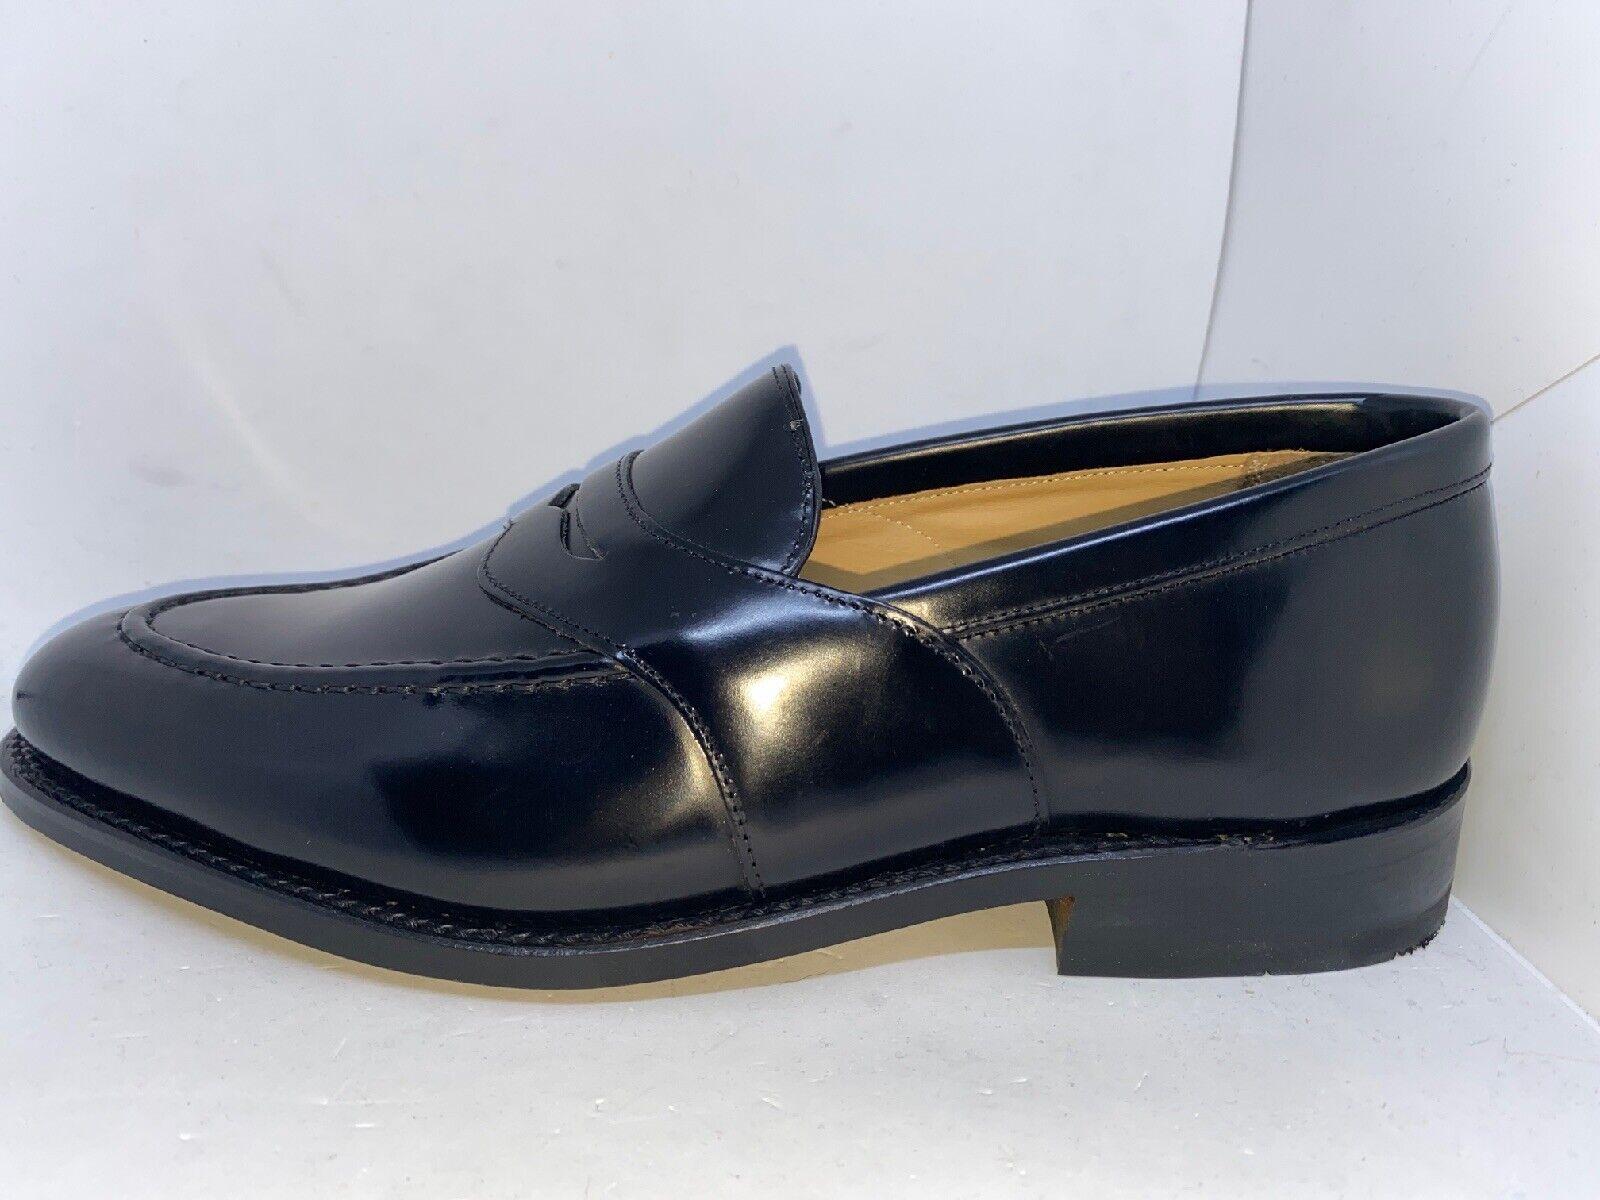 Charles Tyrwhitt formalmente Classic Saddle loafer Business zapatillas uk8 talla 42 nuevo